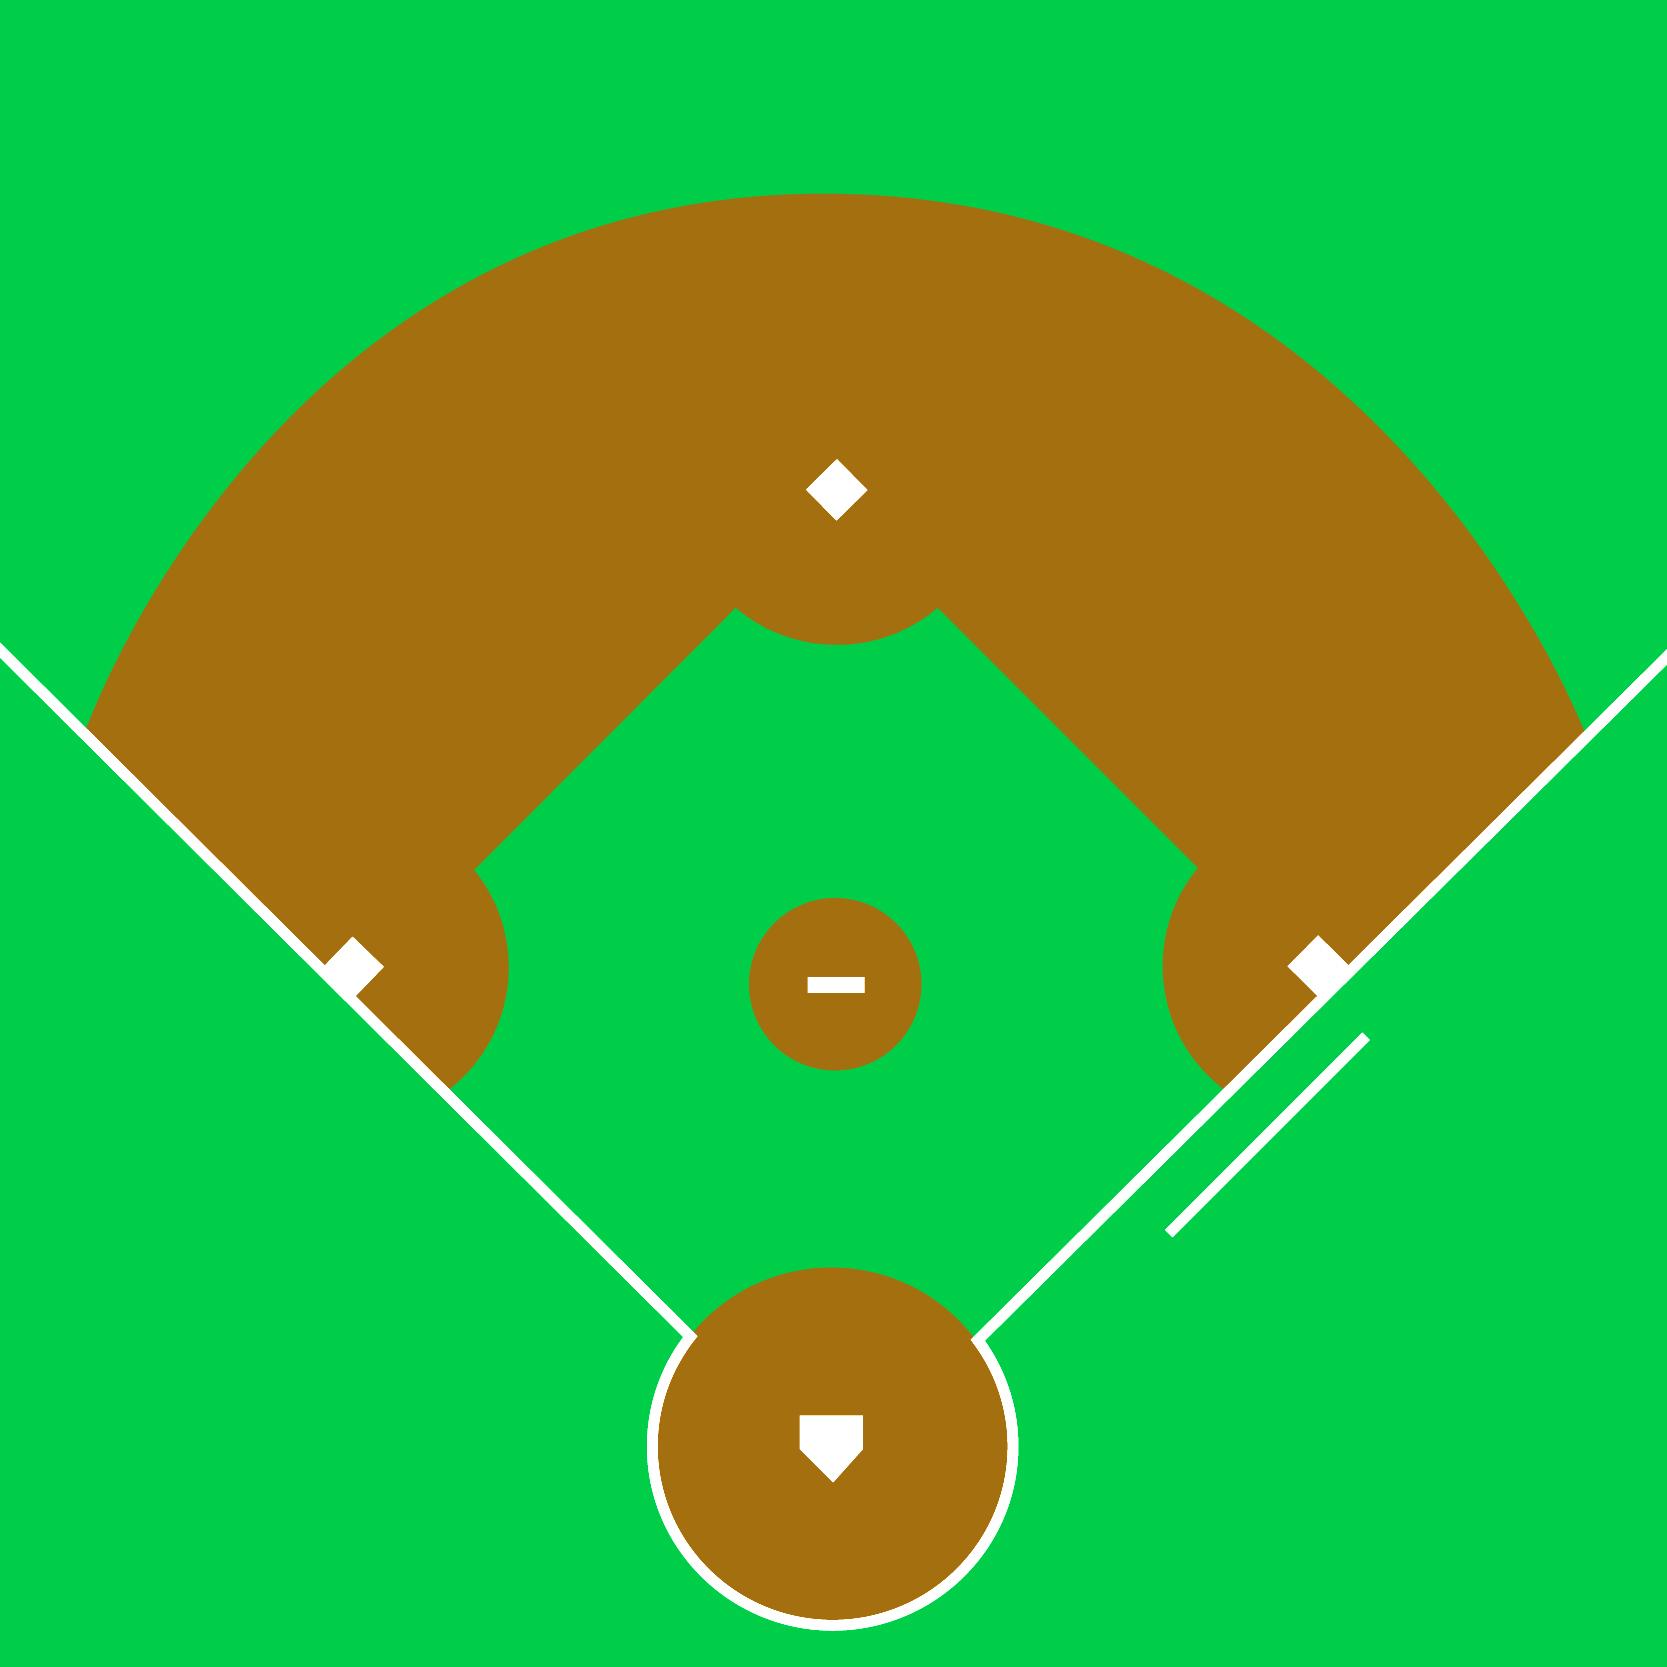 Baseball Diamond Images Baseball Diamond-Baseball Diamond Images Baseball Diamond And Bats On-13